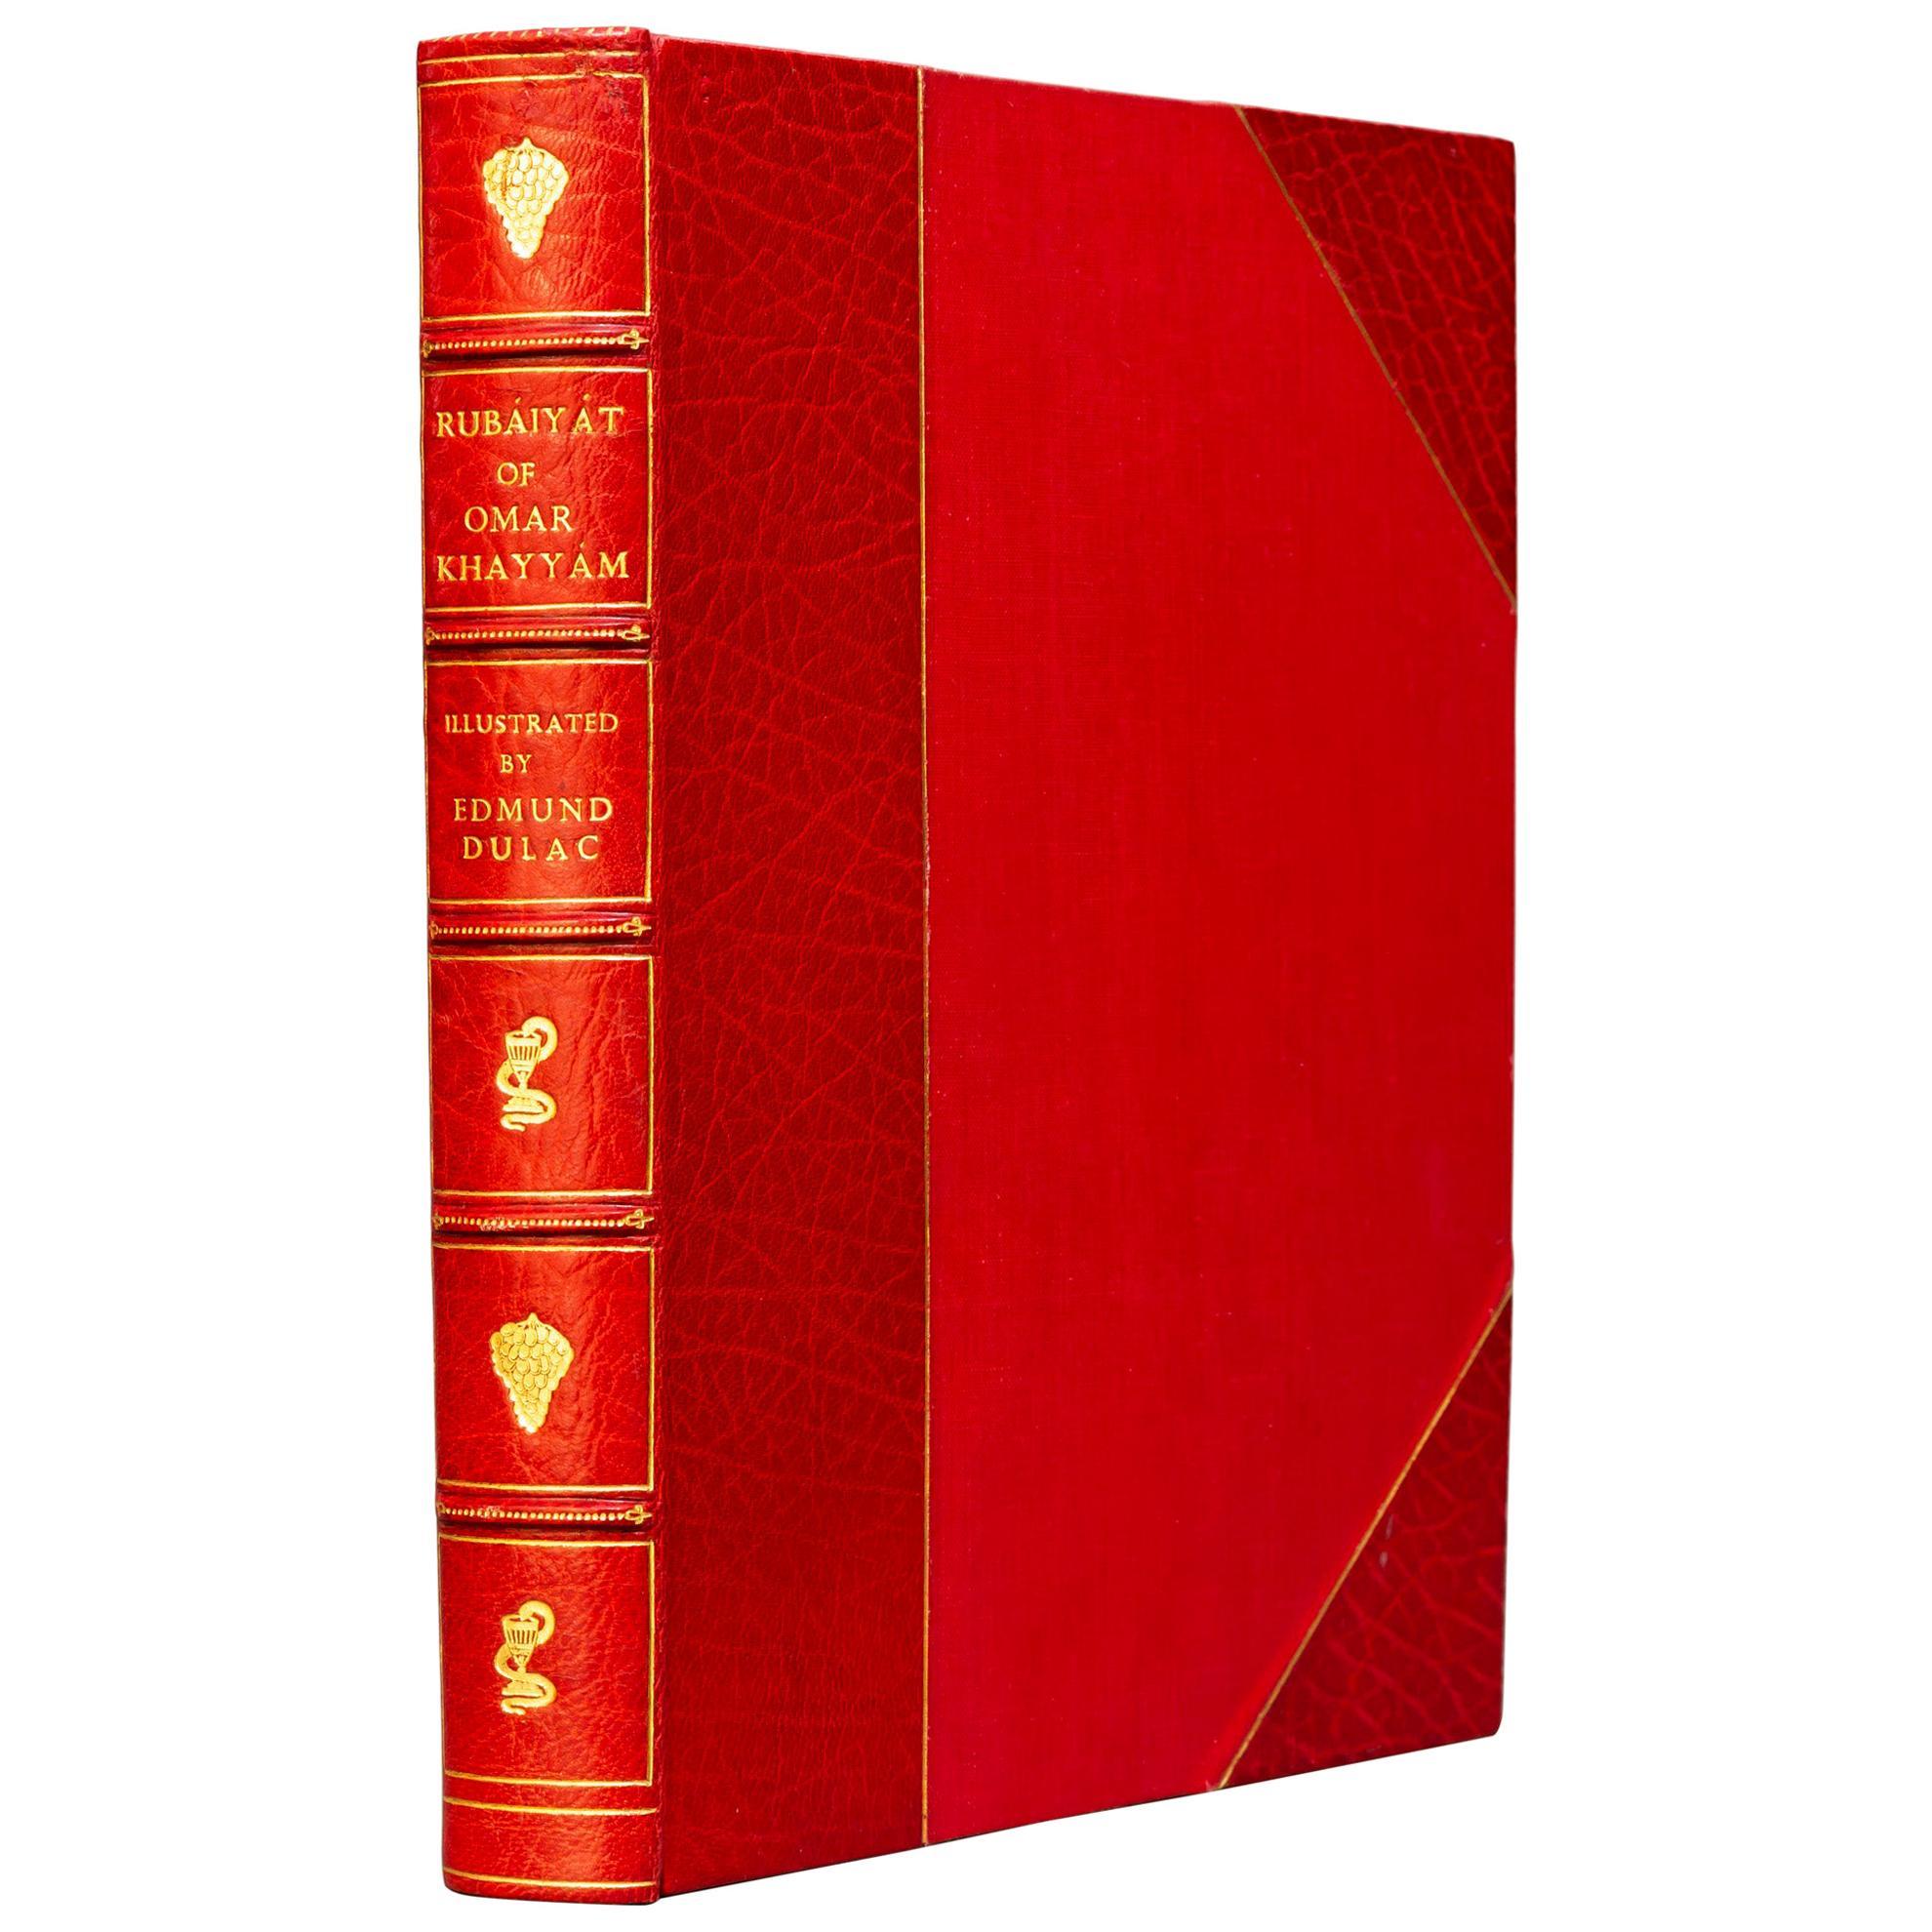 Edward Fitzgerald Rubaiyat of Omar Khayyam